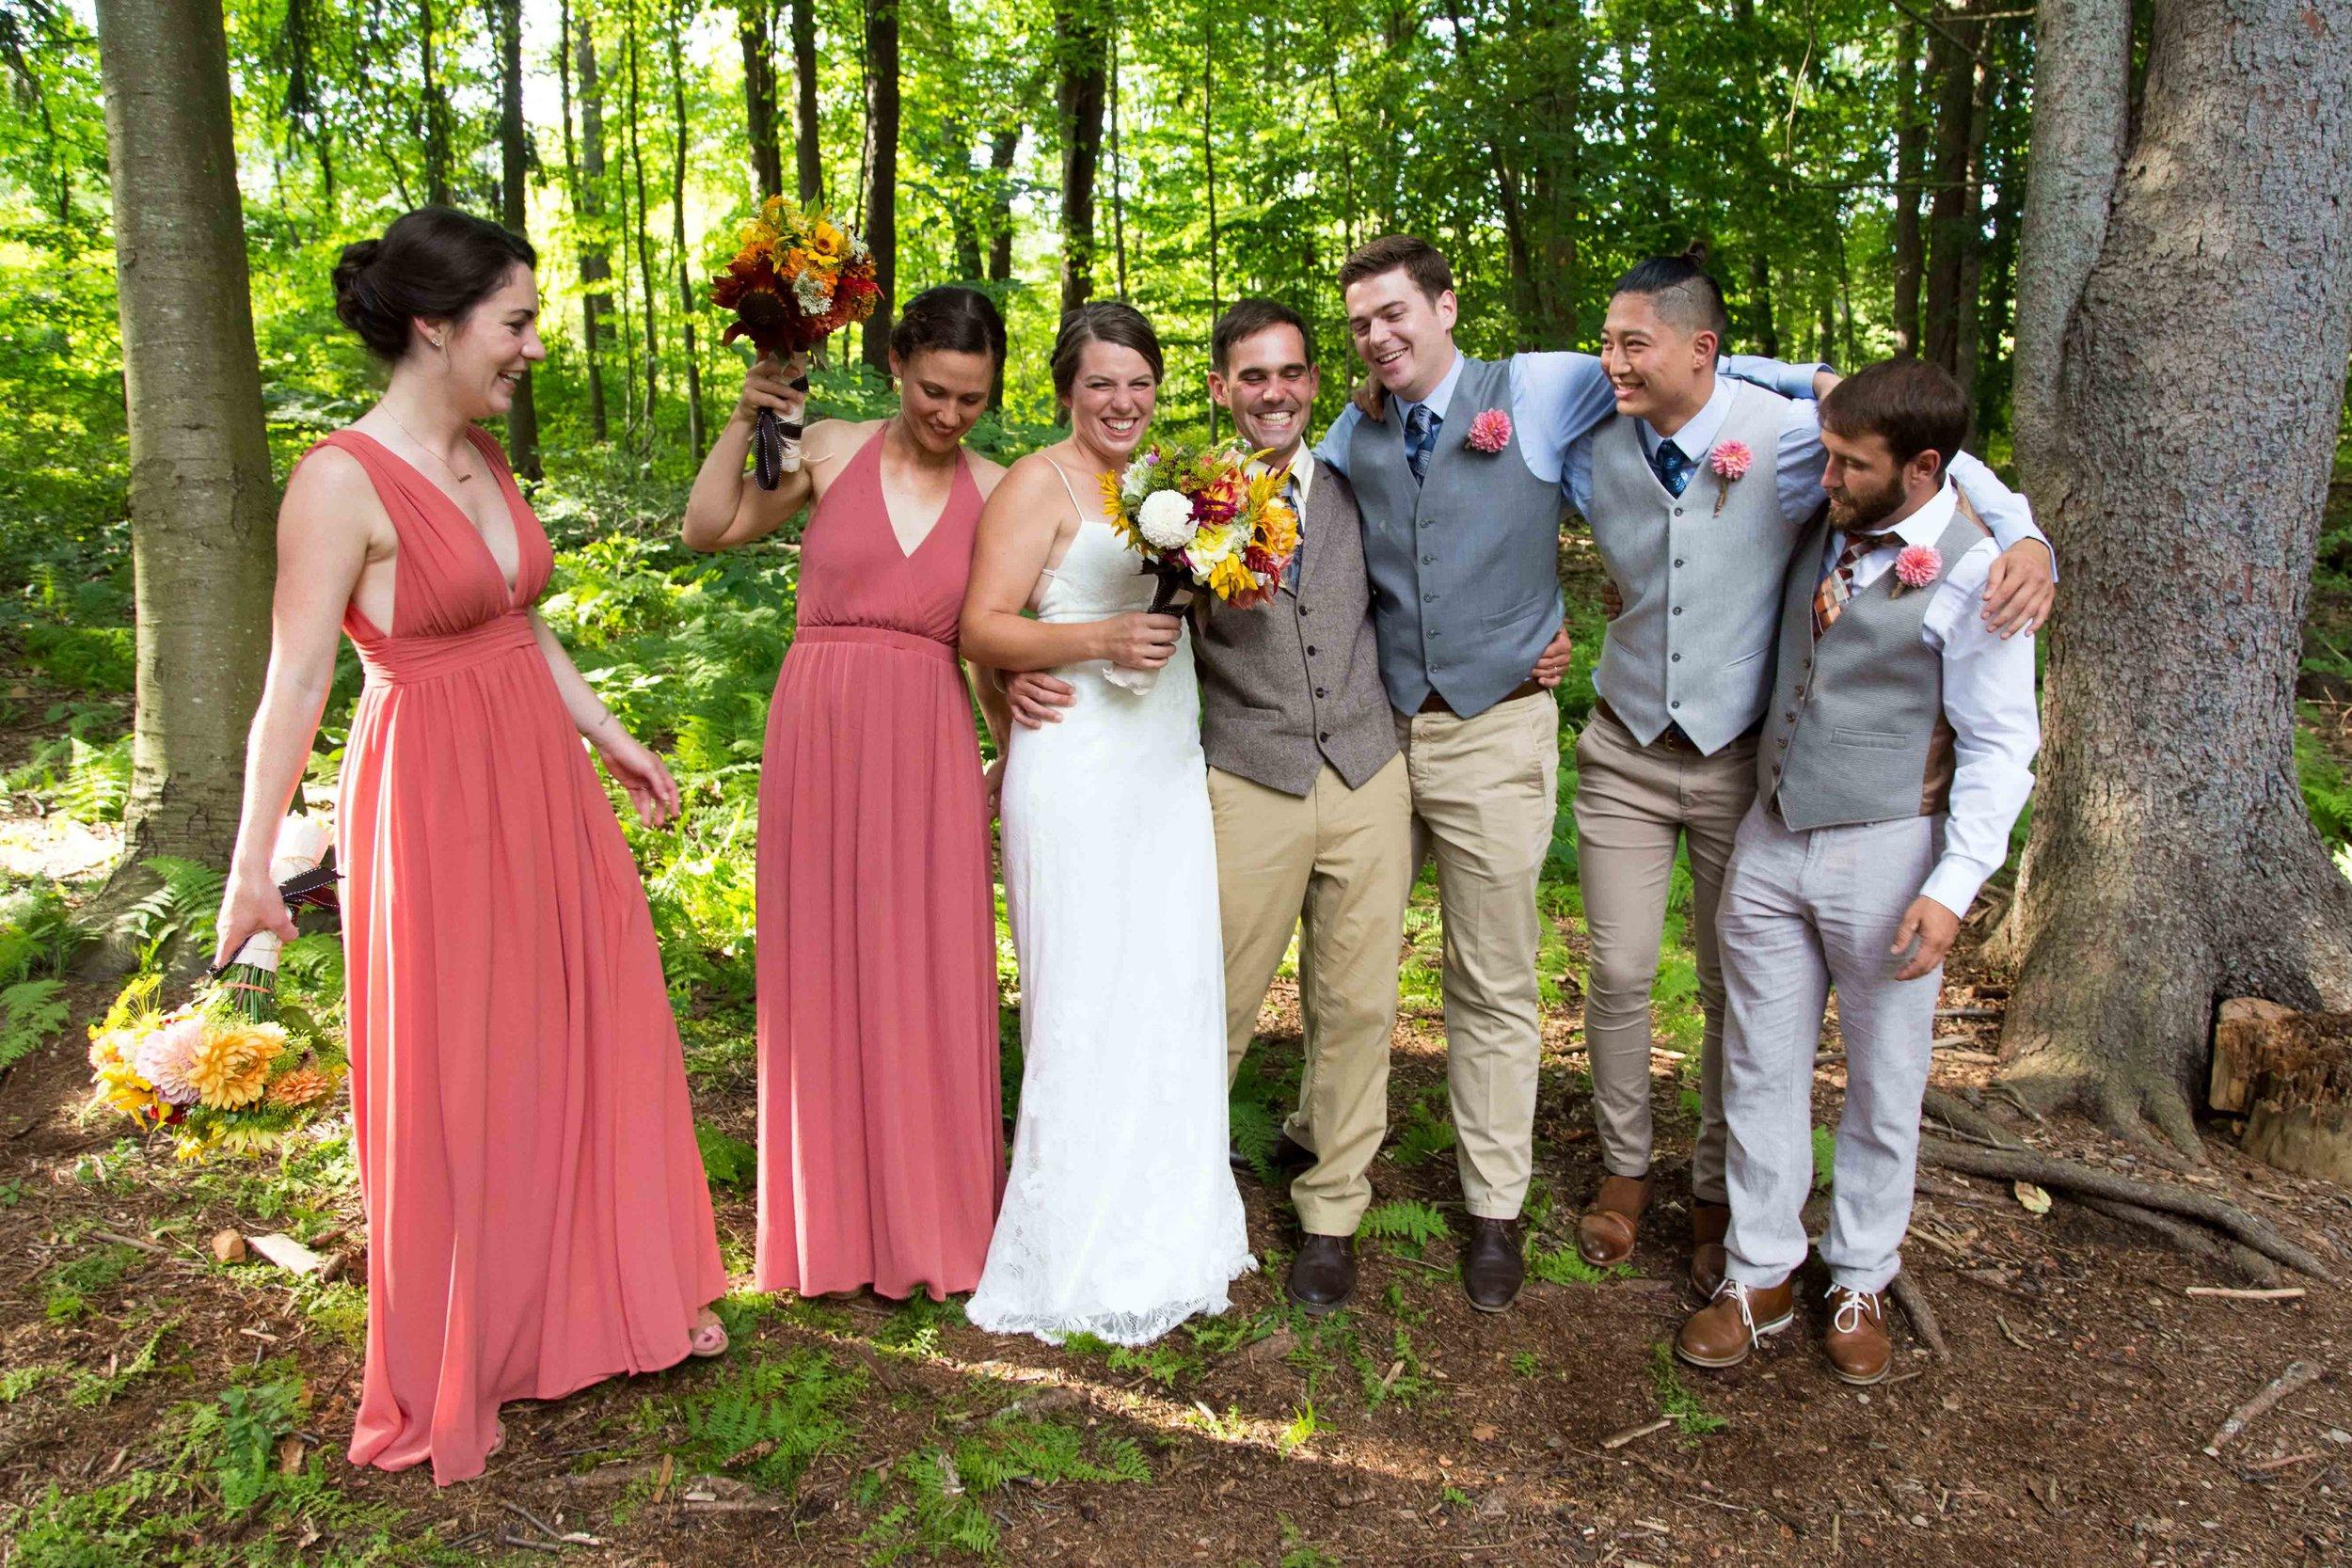 Maskers Barn Deserted Village Berkley Heights NJ Wedding Photographer-50.jpg